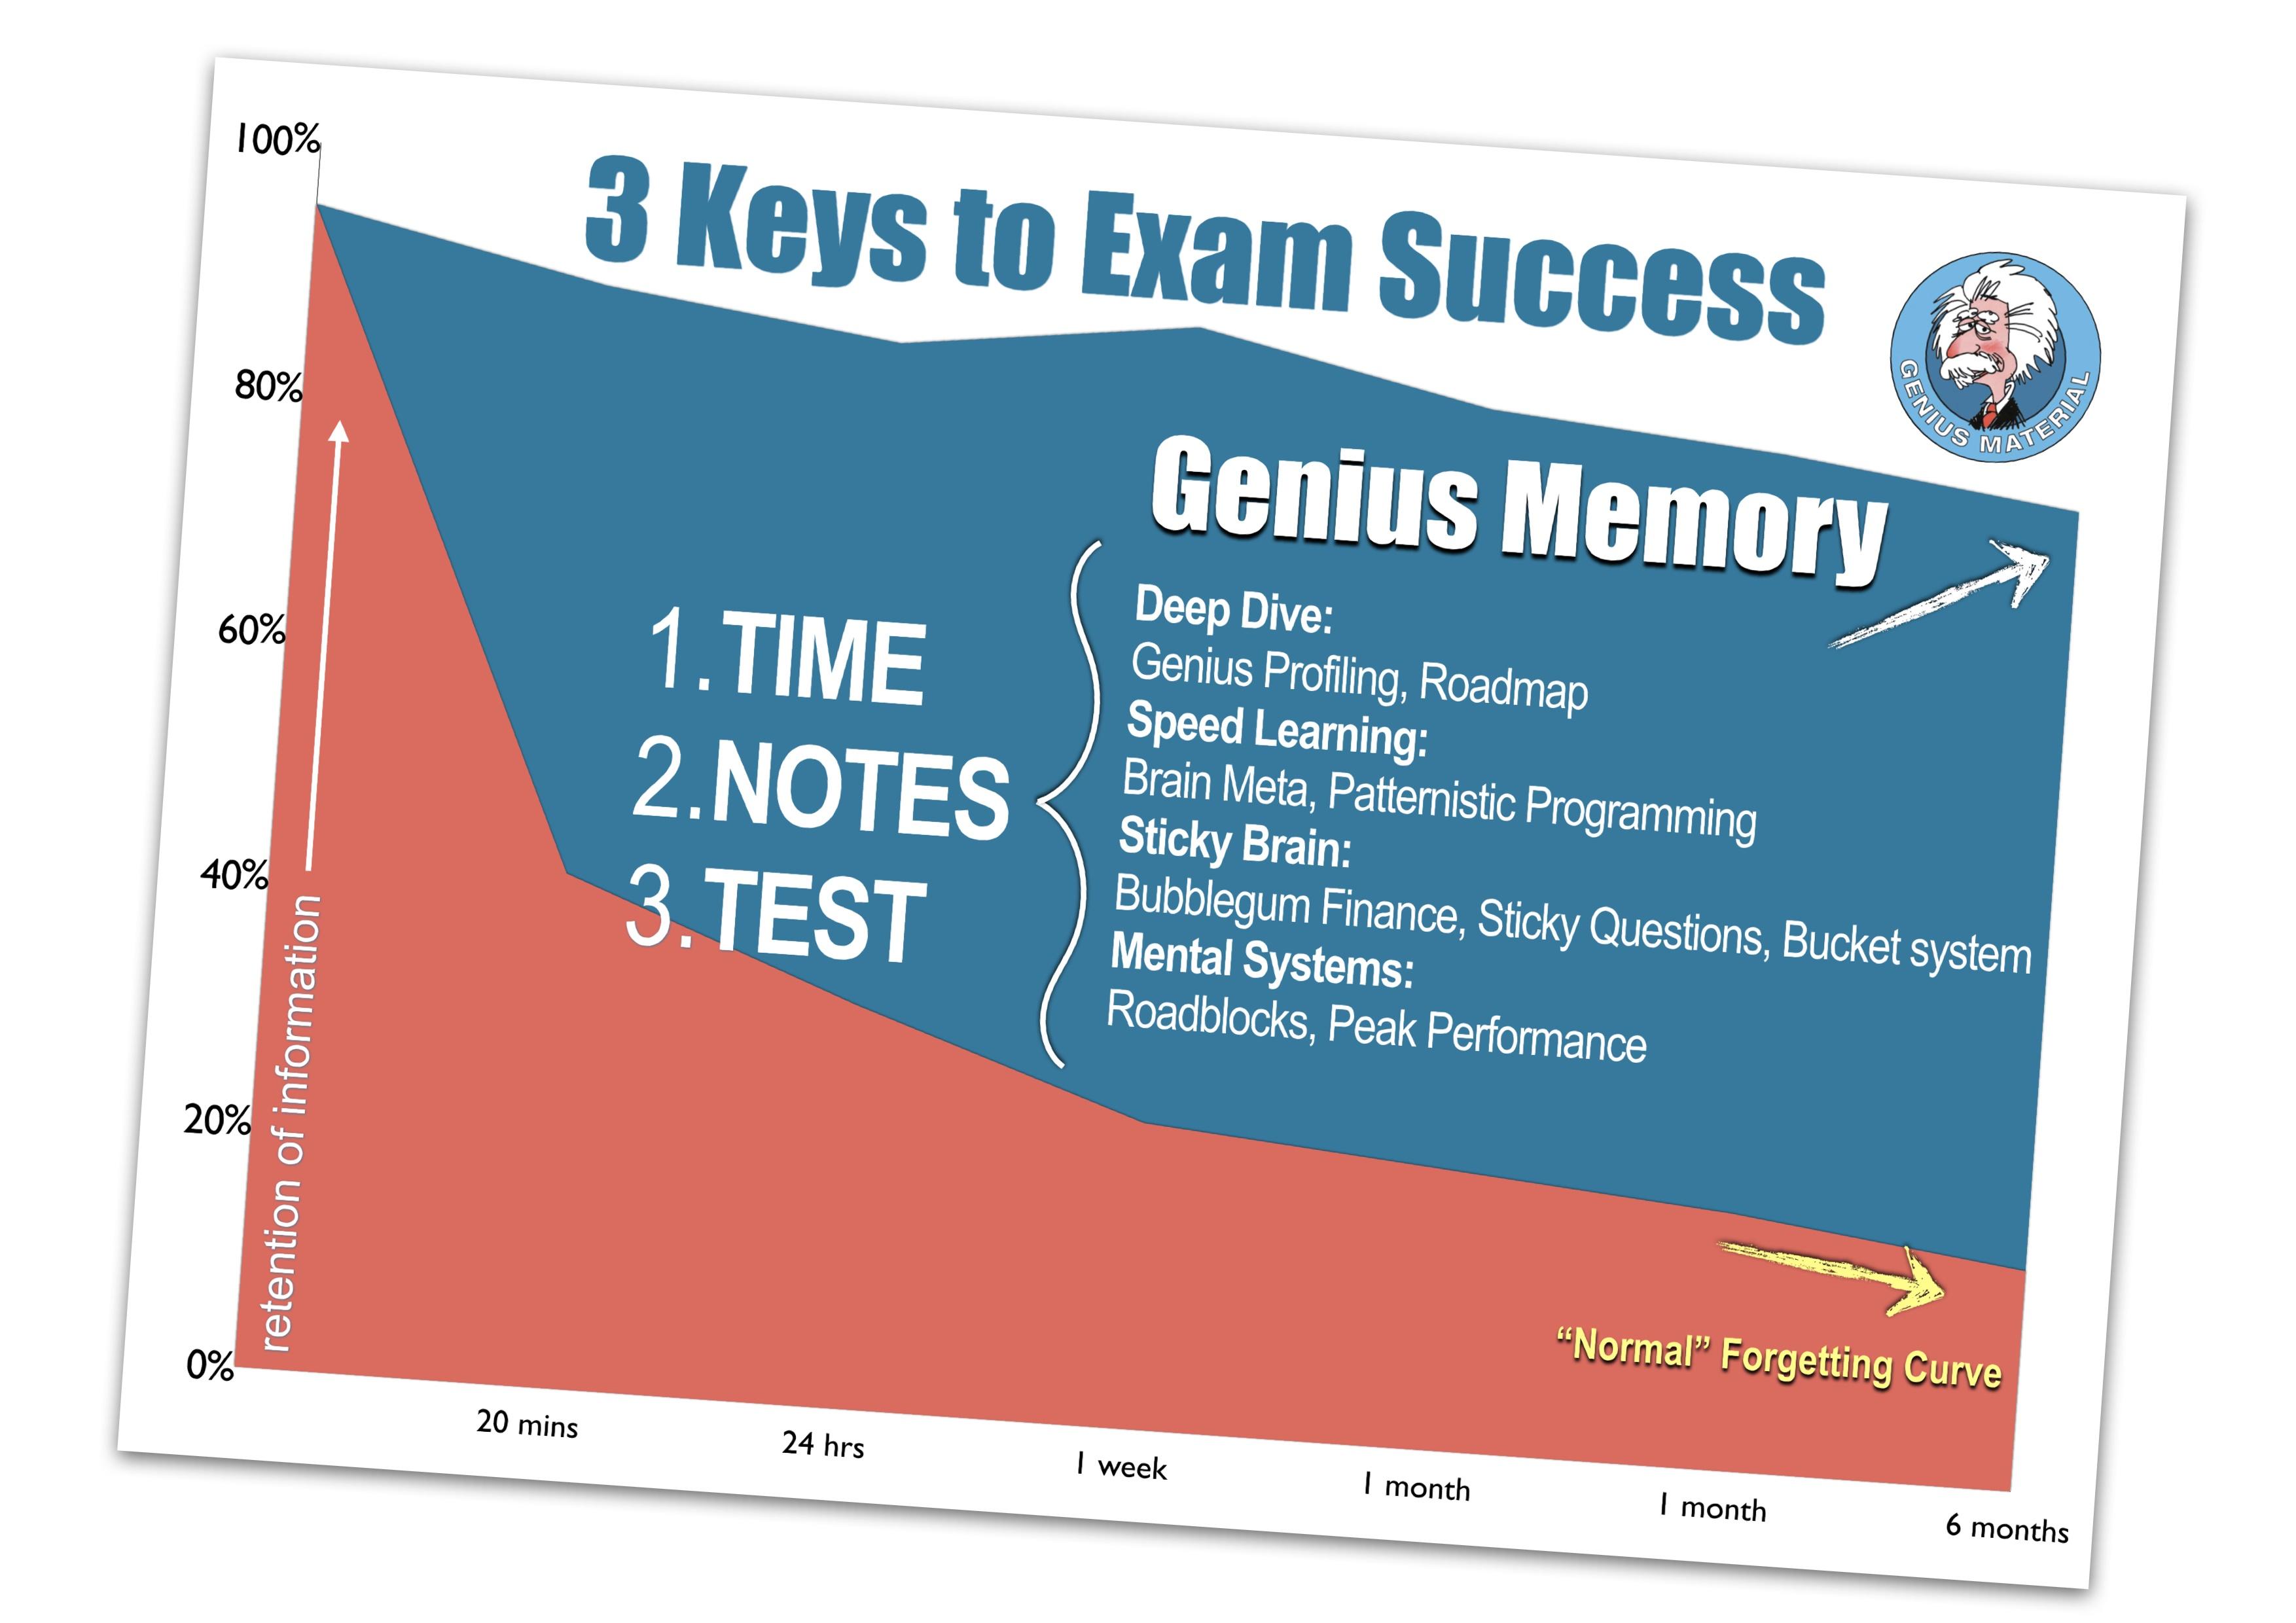 3 Keys to exam success